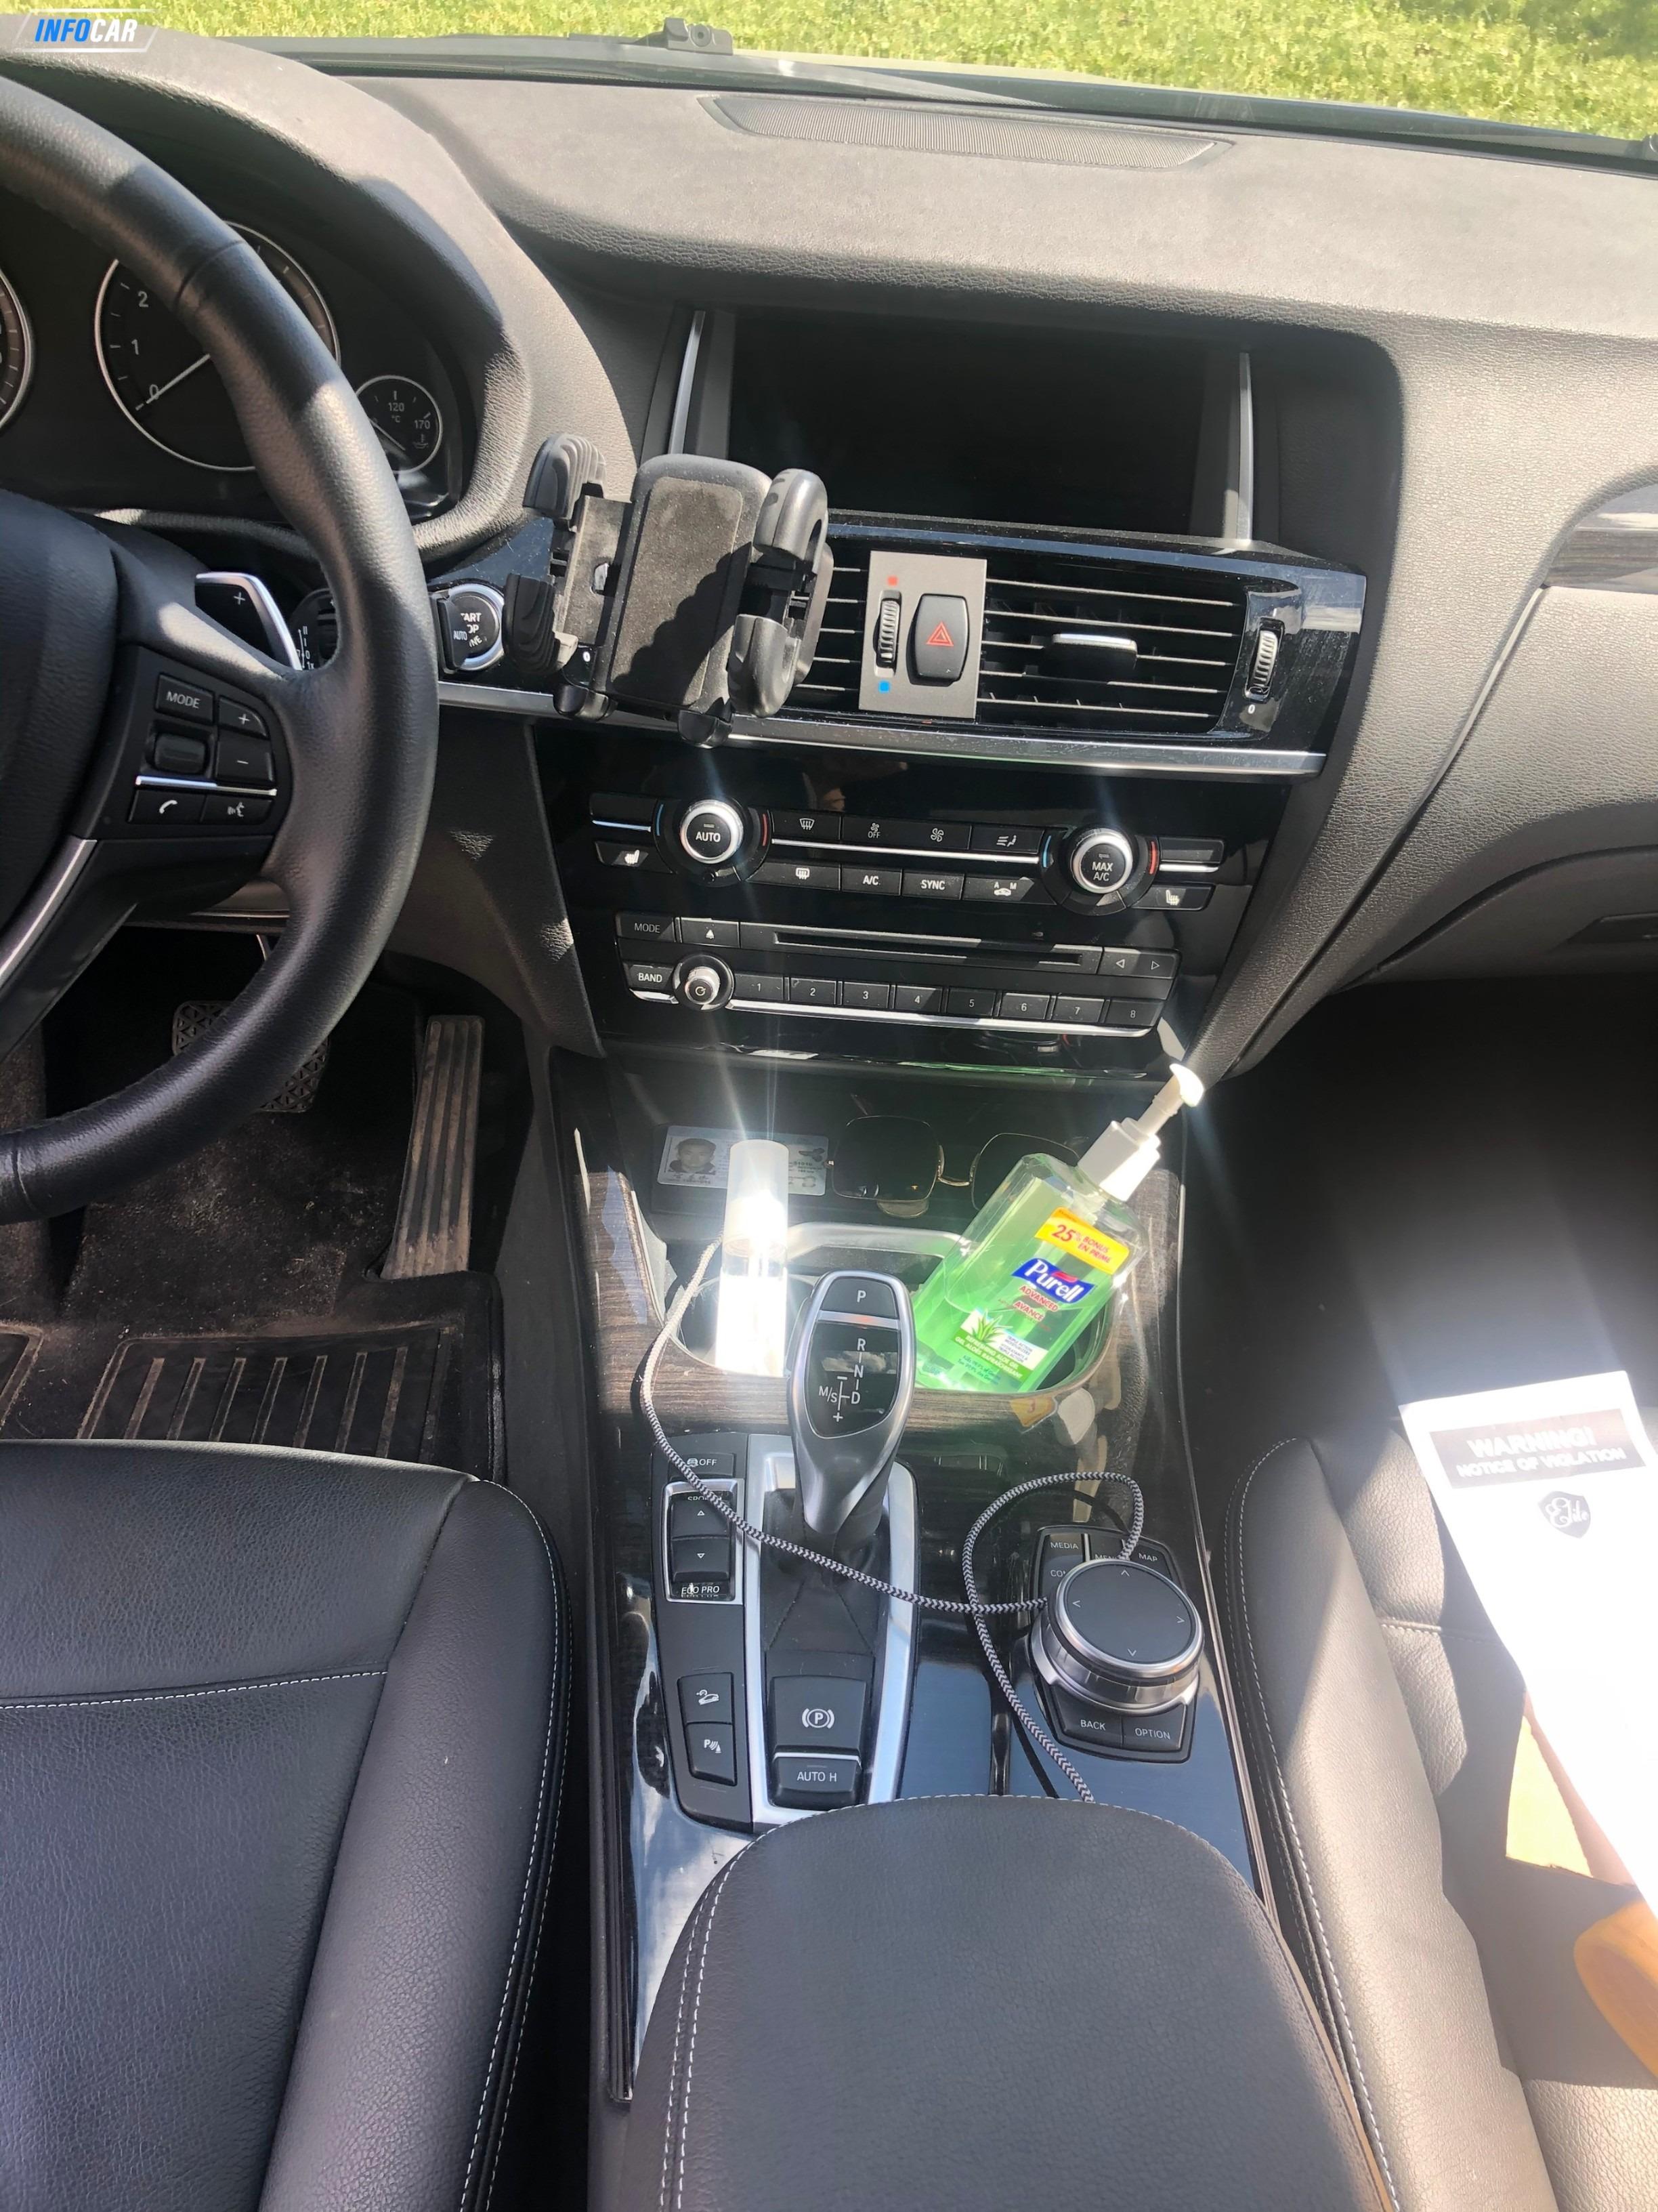 2018 BMW X4 28i - INFOCAR - Toronto's Most Comprehensive New and Used Auto Trading Platform